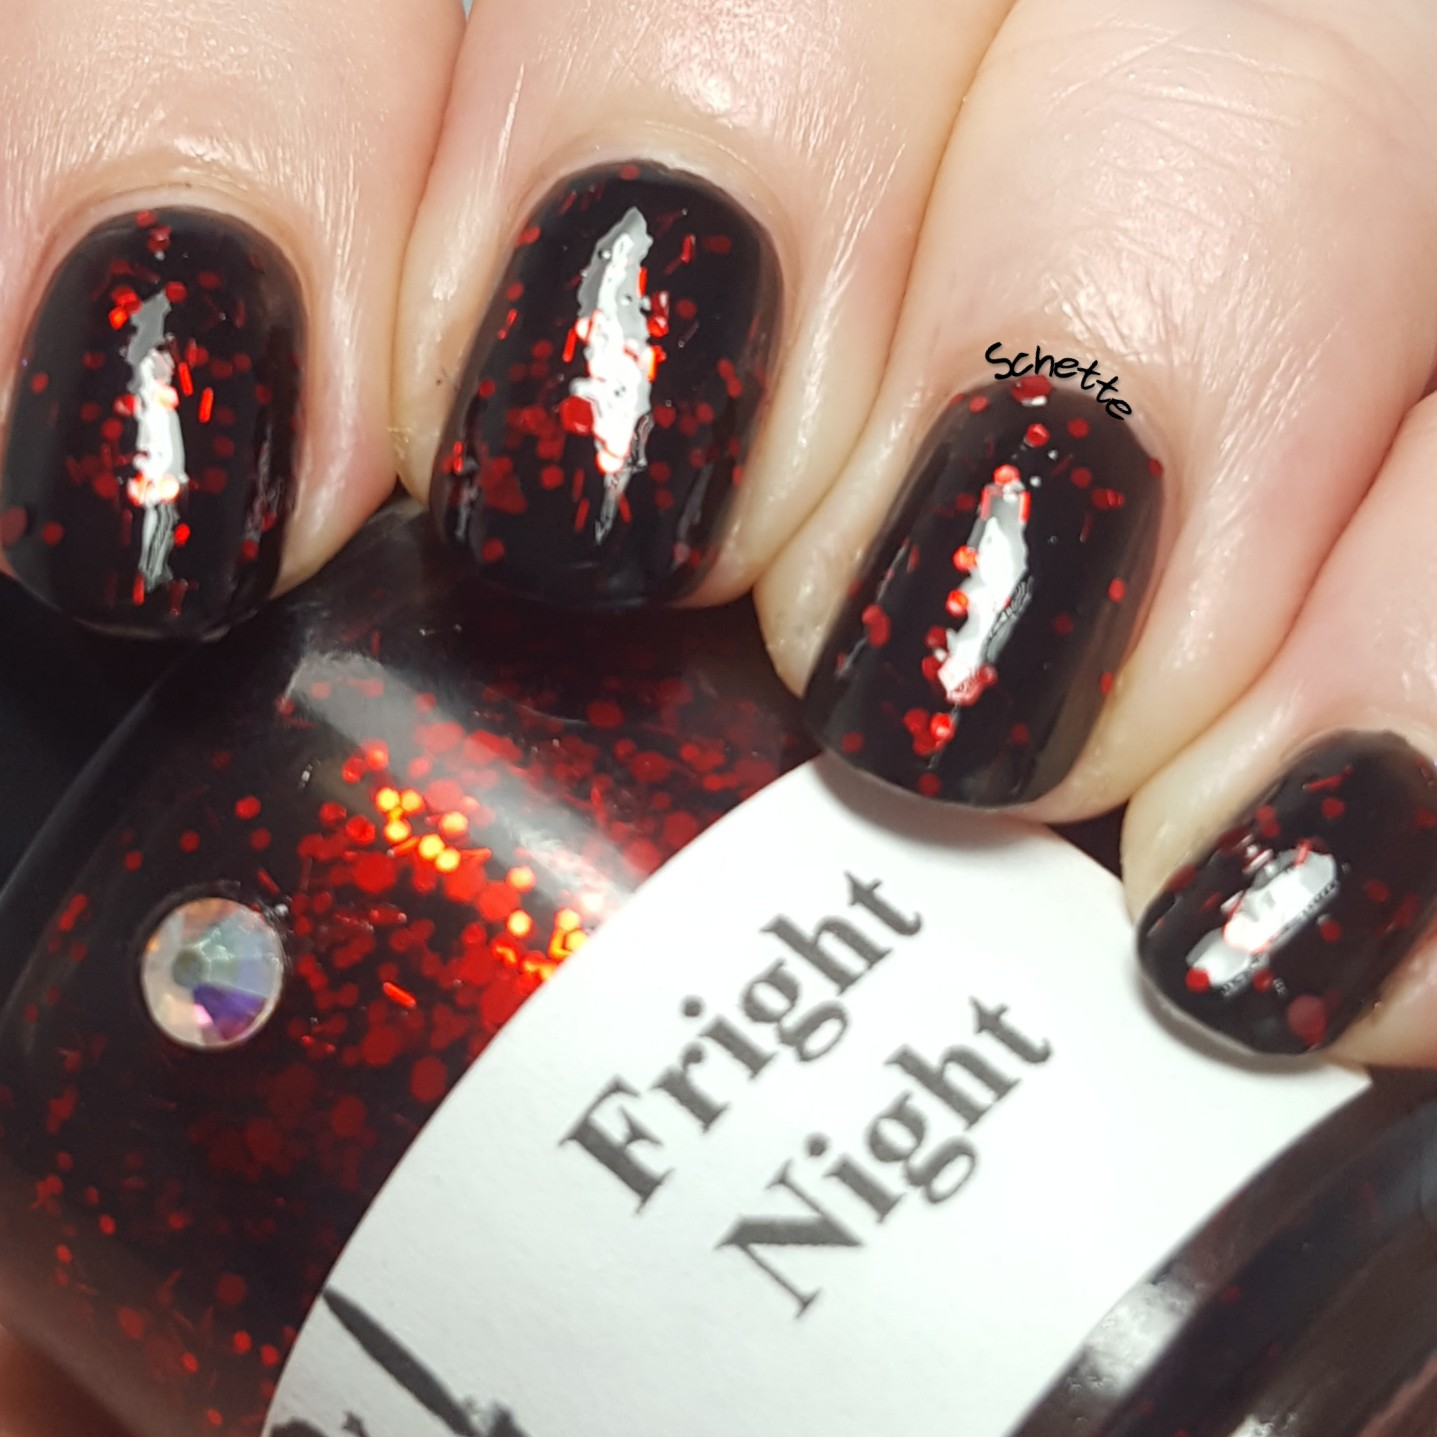 Girly Bits - Fright Night